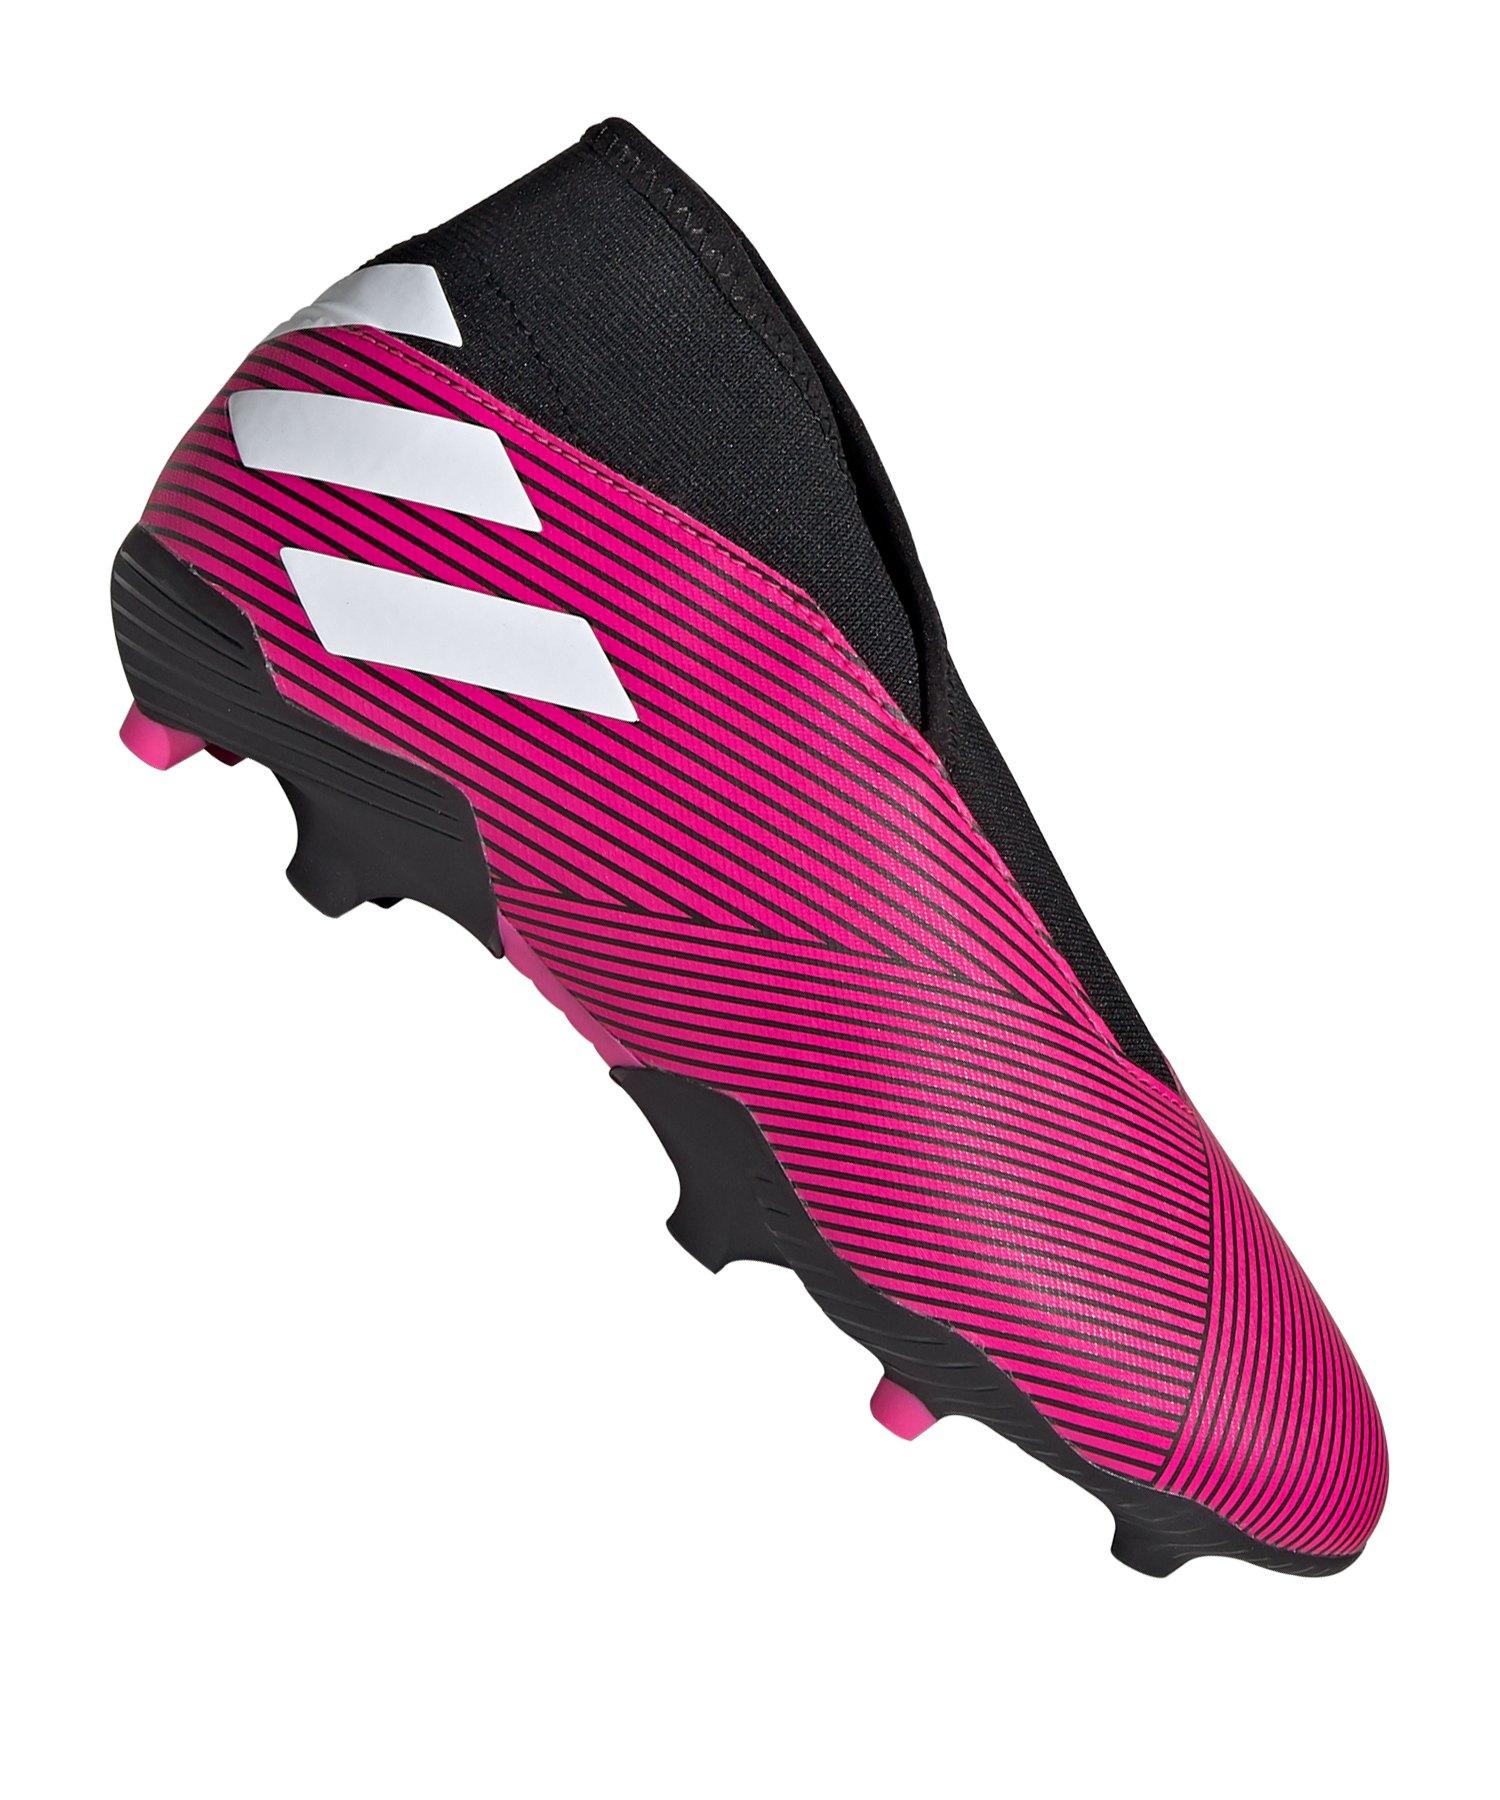 adidas NEMEZIZ 19.3 LL FG Kids Pink